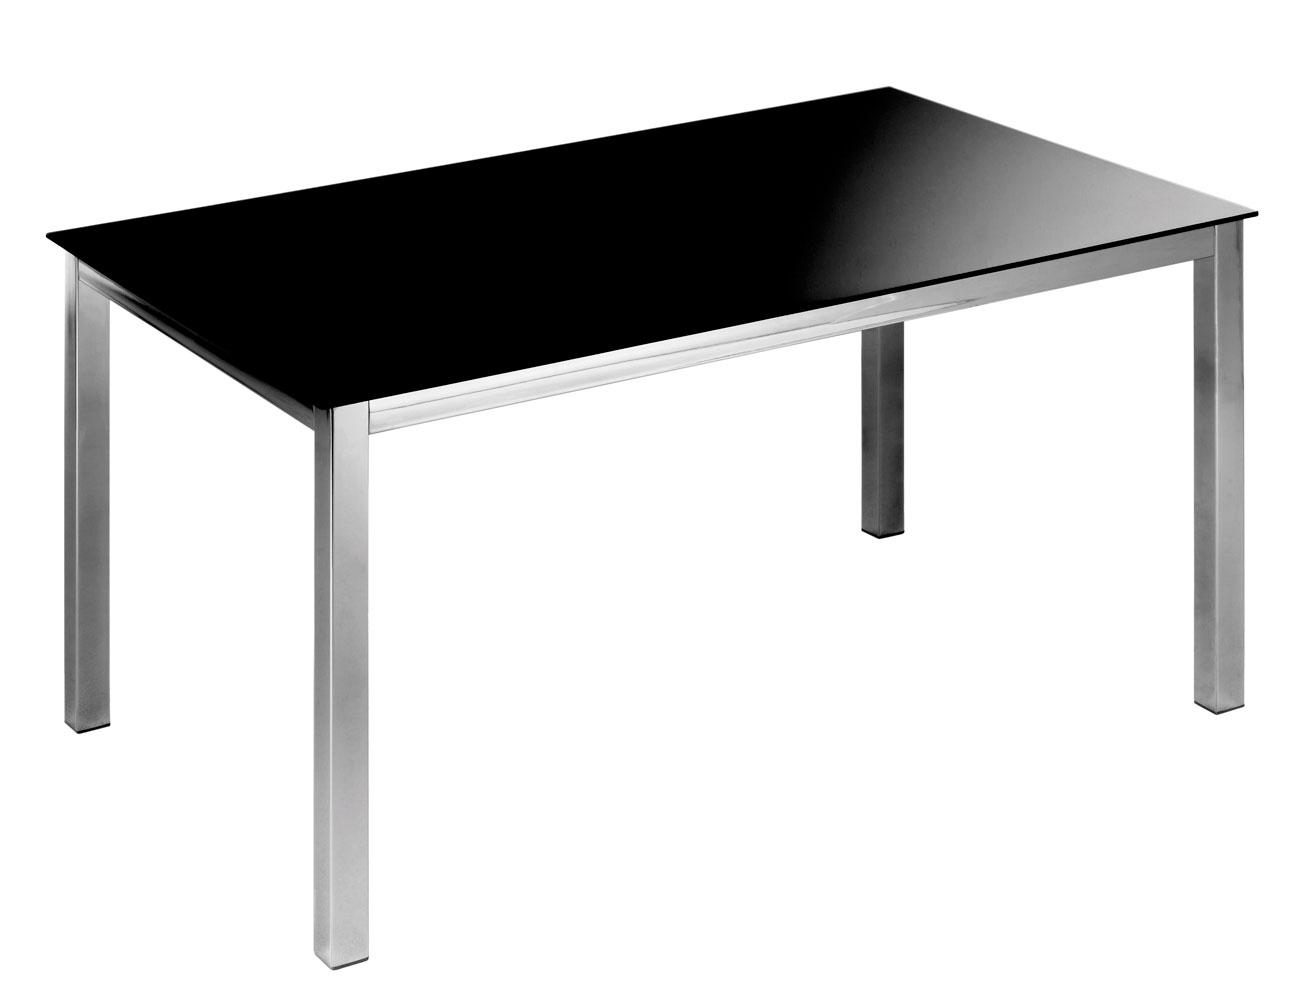 Mesa comedor cristal templado cromada 201 negra